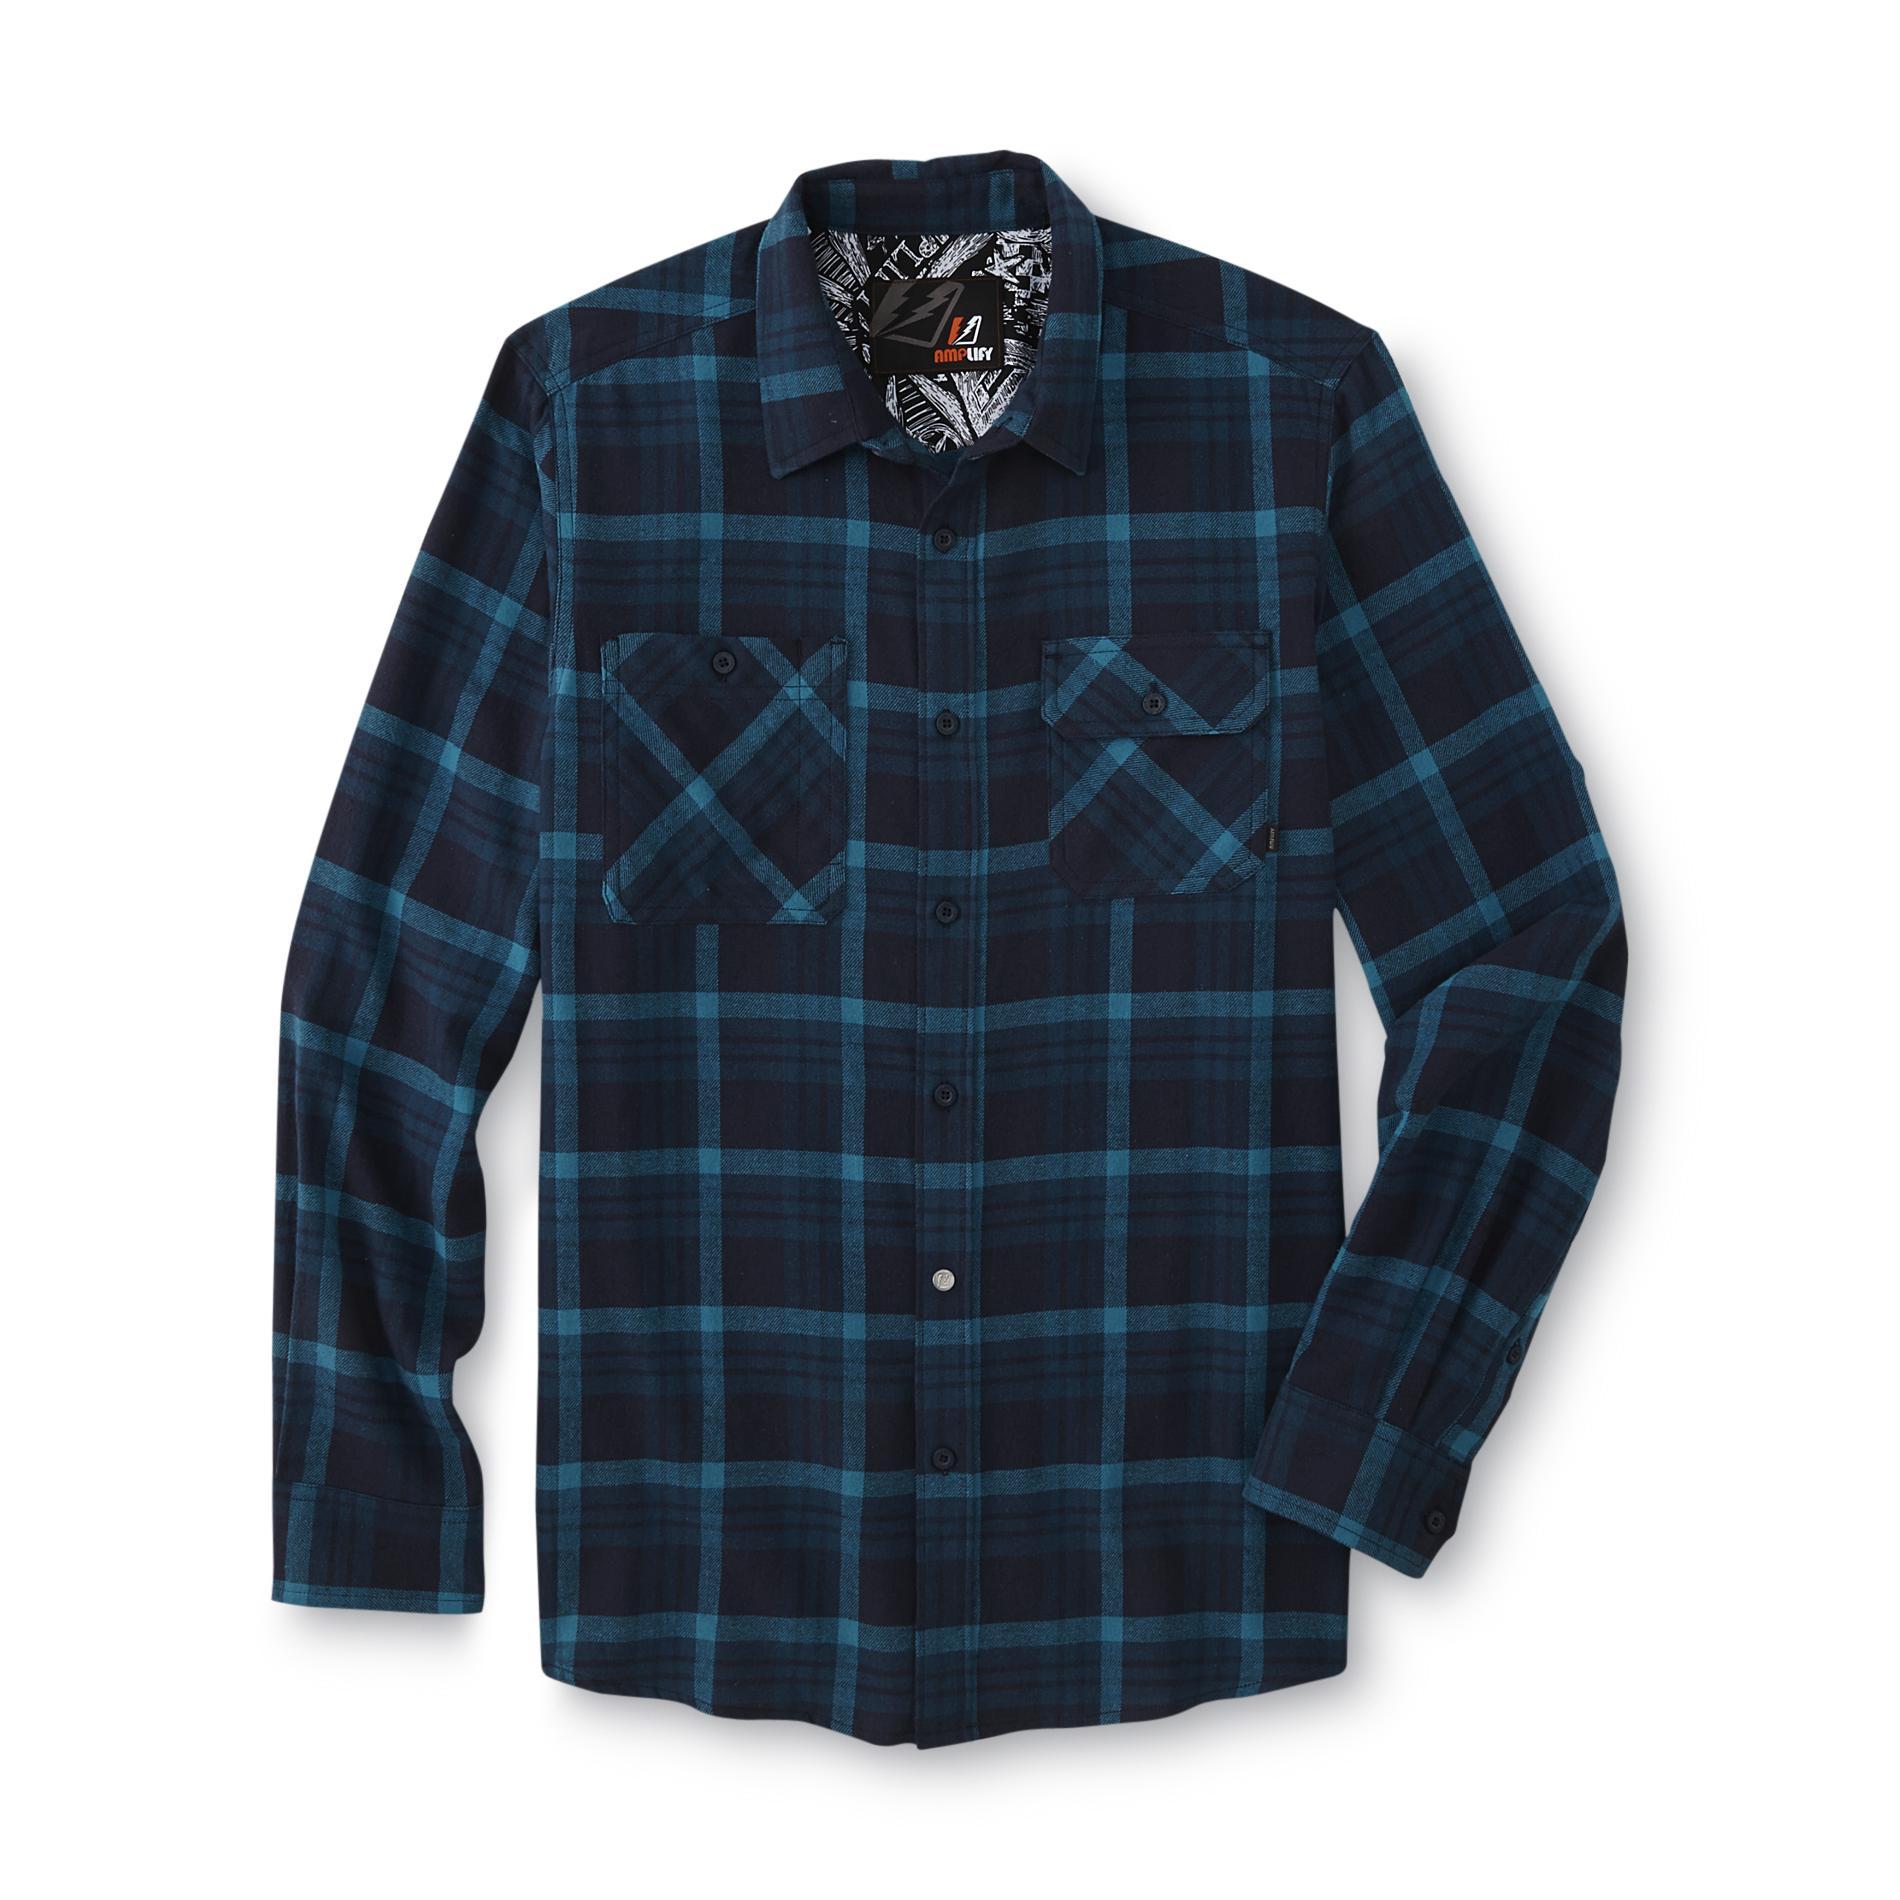 Amplify Young Men's Button-Front Shirt - Plaid